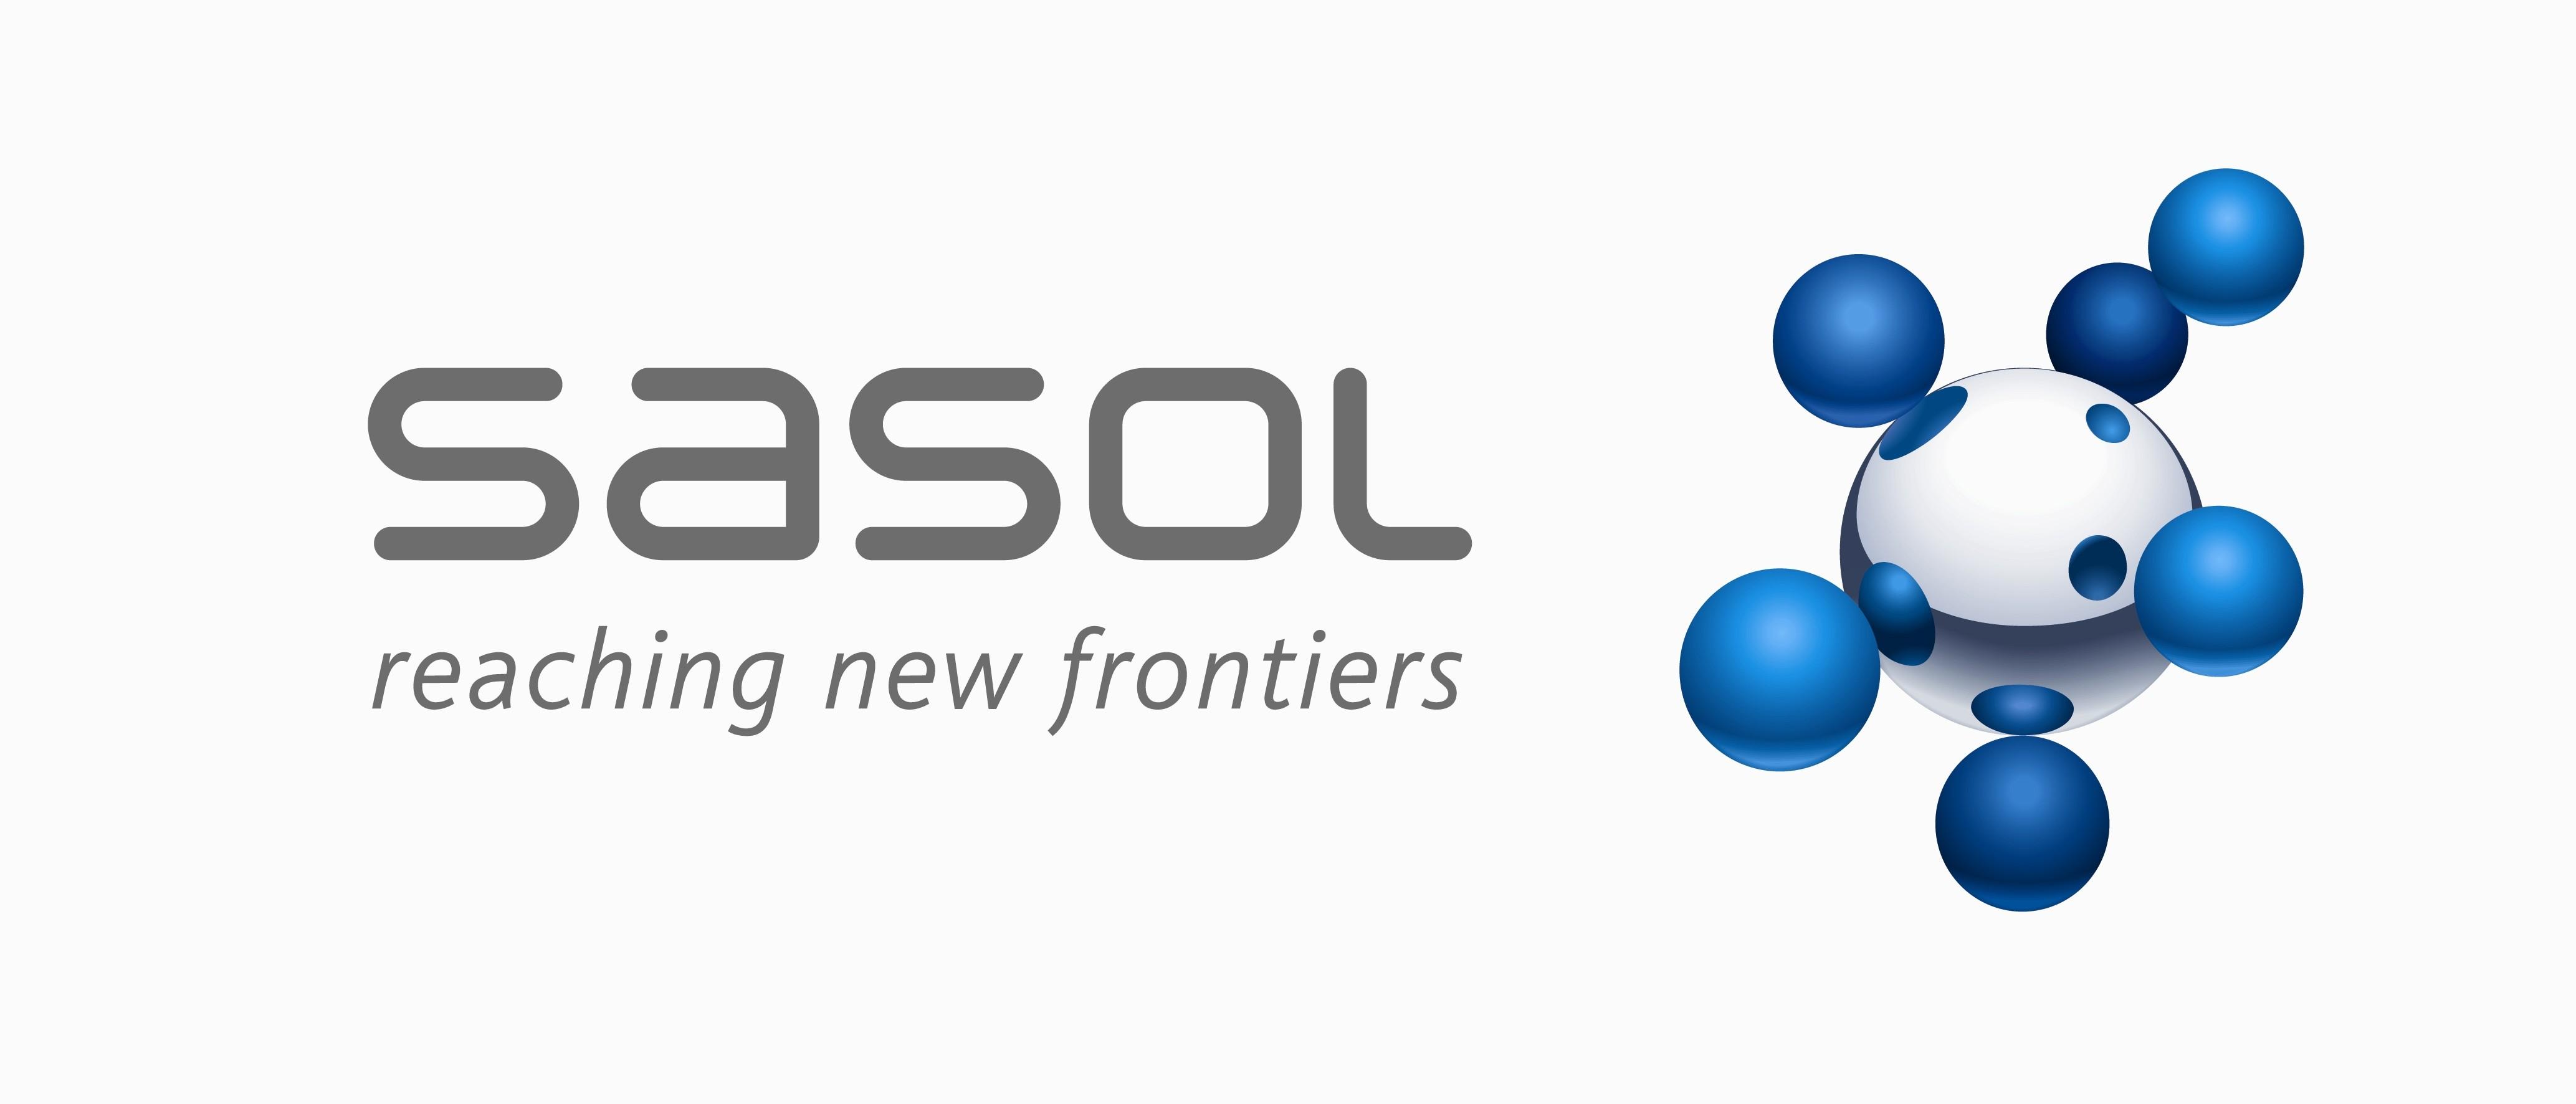 Sasol Logo Wallpaper